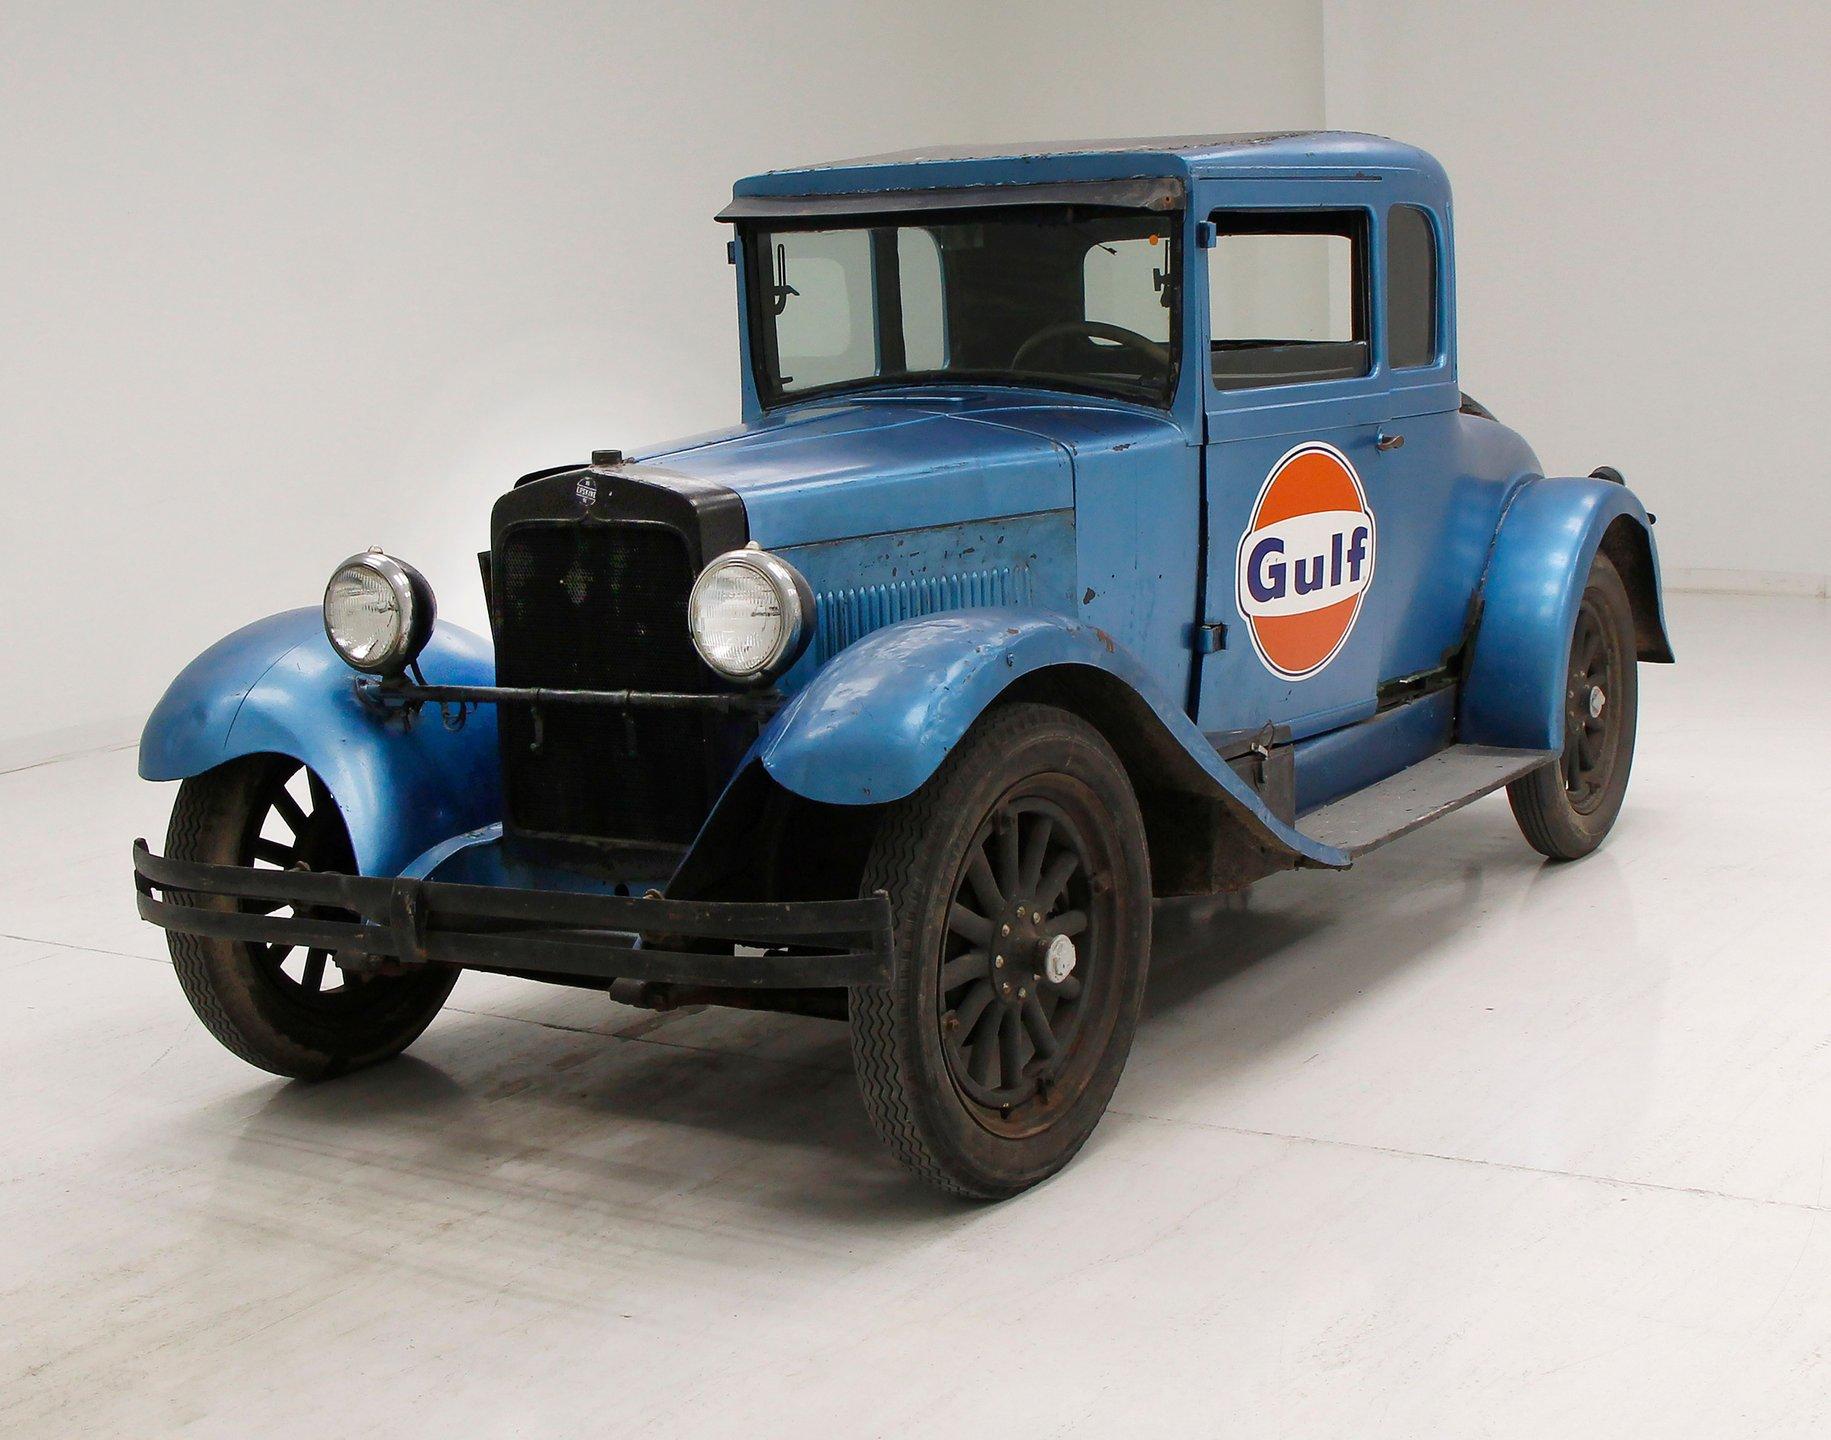 1928 Erskine Studebaker Coupe